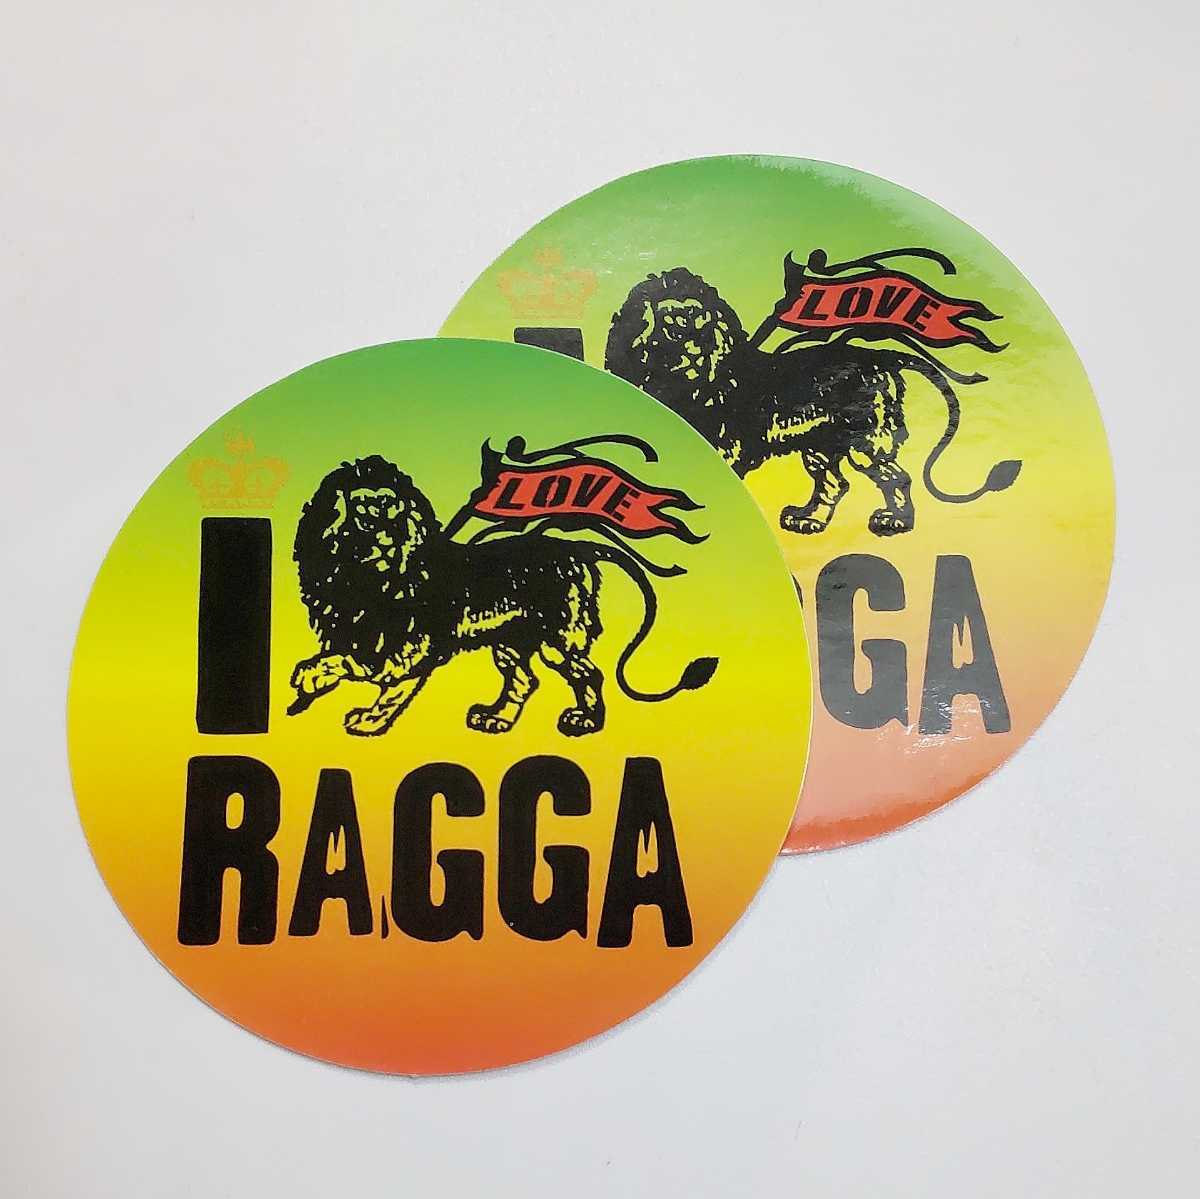 I LOVE RAGGA ステッカー レゲエ★検)ノベルティー シール 非売品 販促品 デッドストック 当時物 I LUV REGGAE ジャマイカ JAMAICA ラスタ_画像1